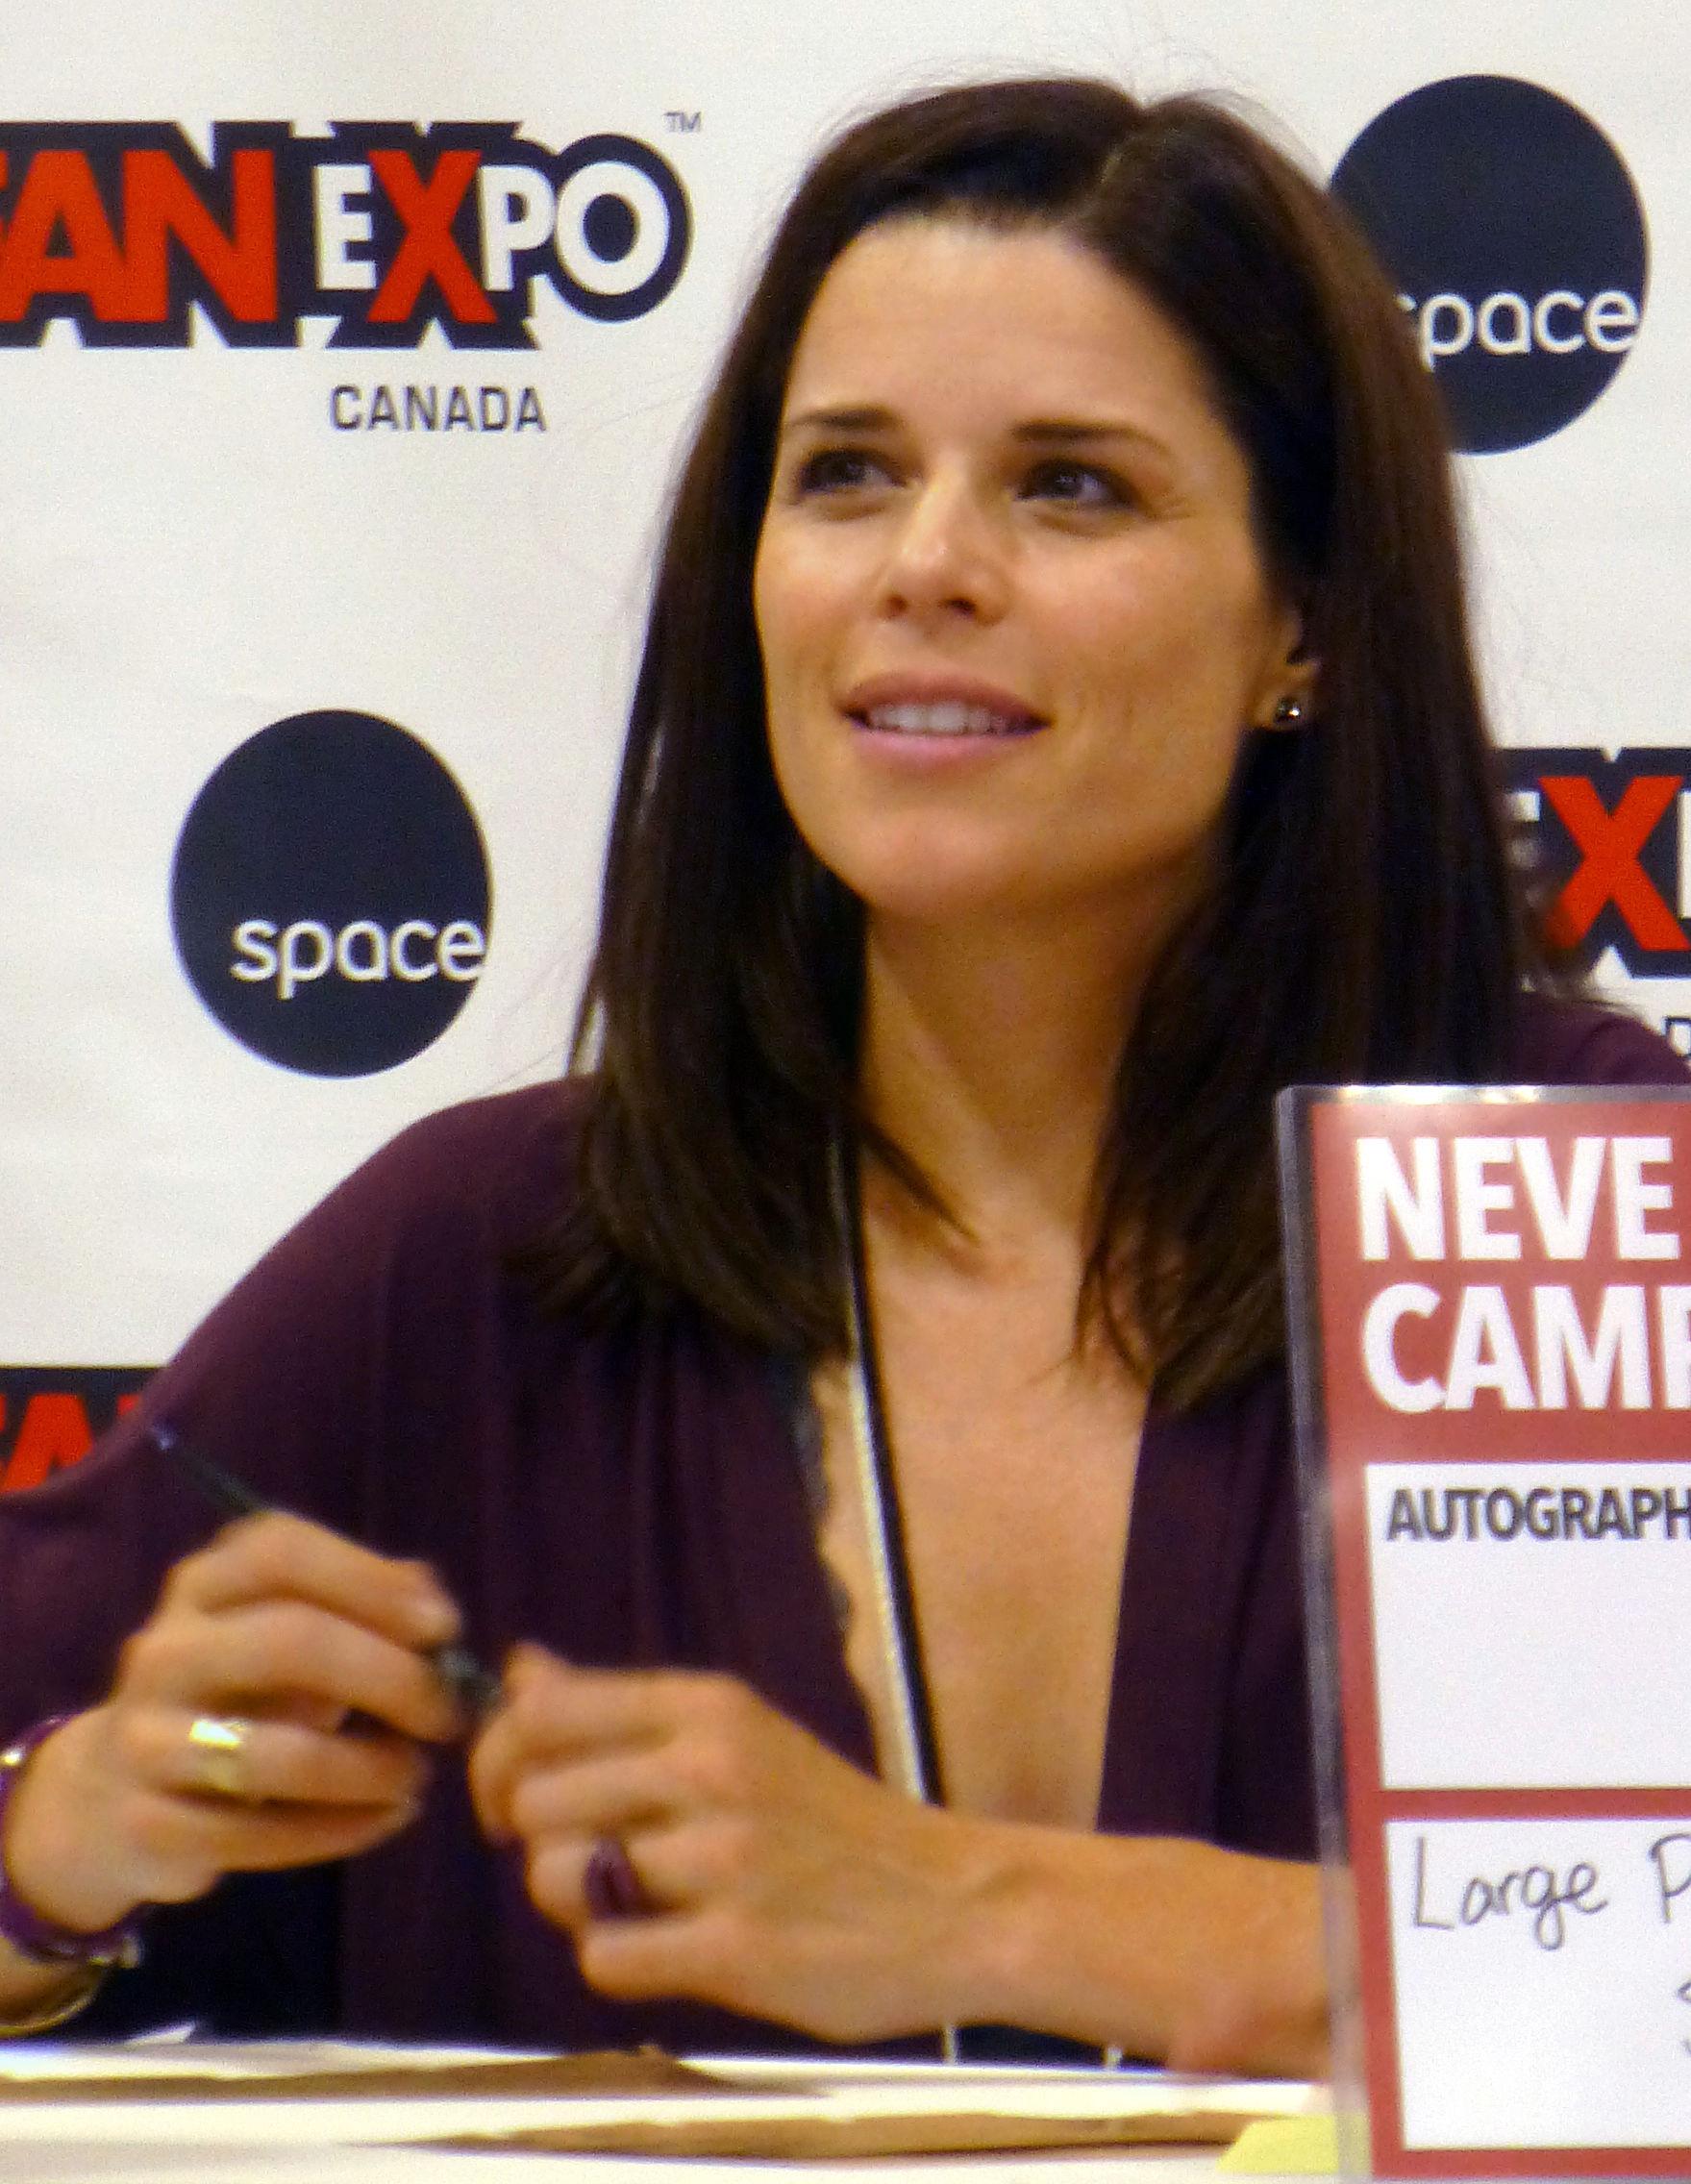 Photo of Neve Campbell: Canadian actress